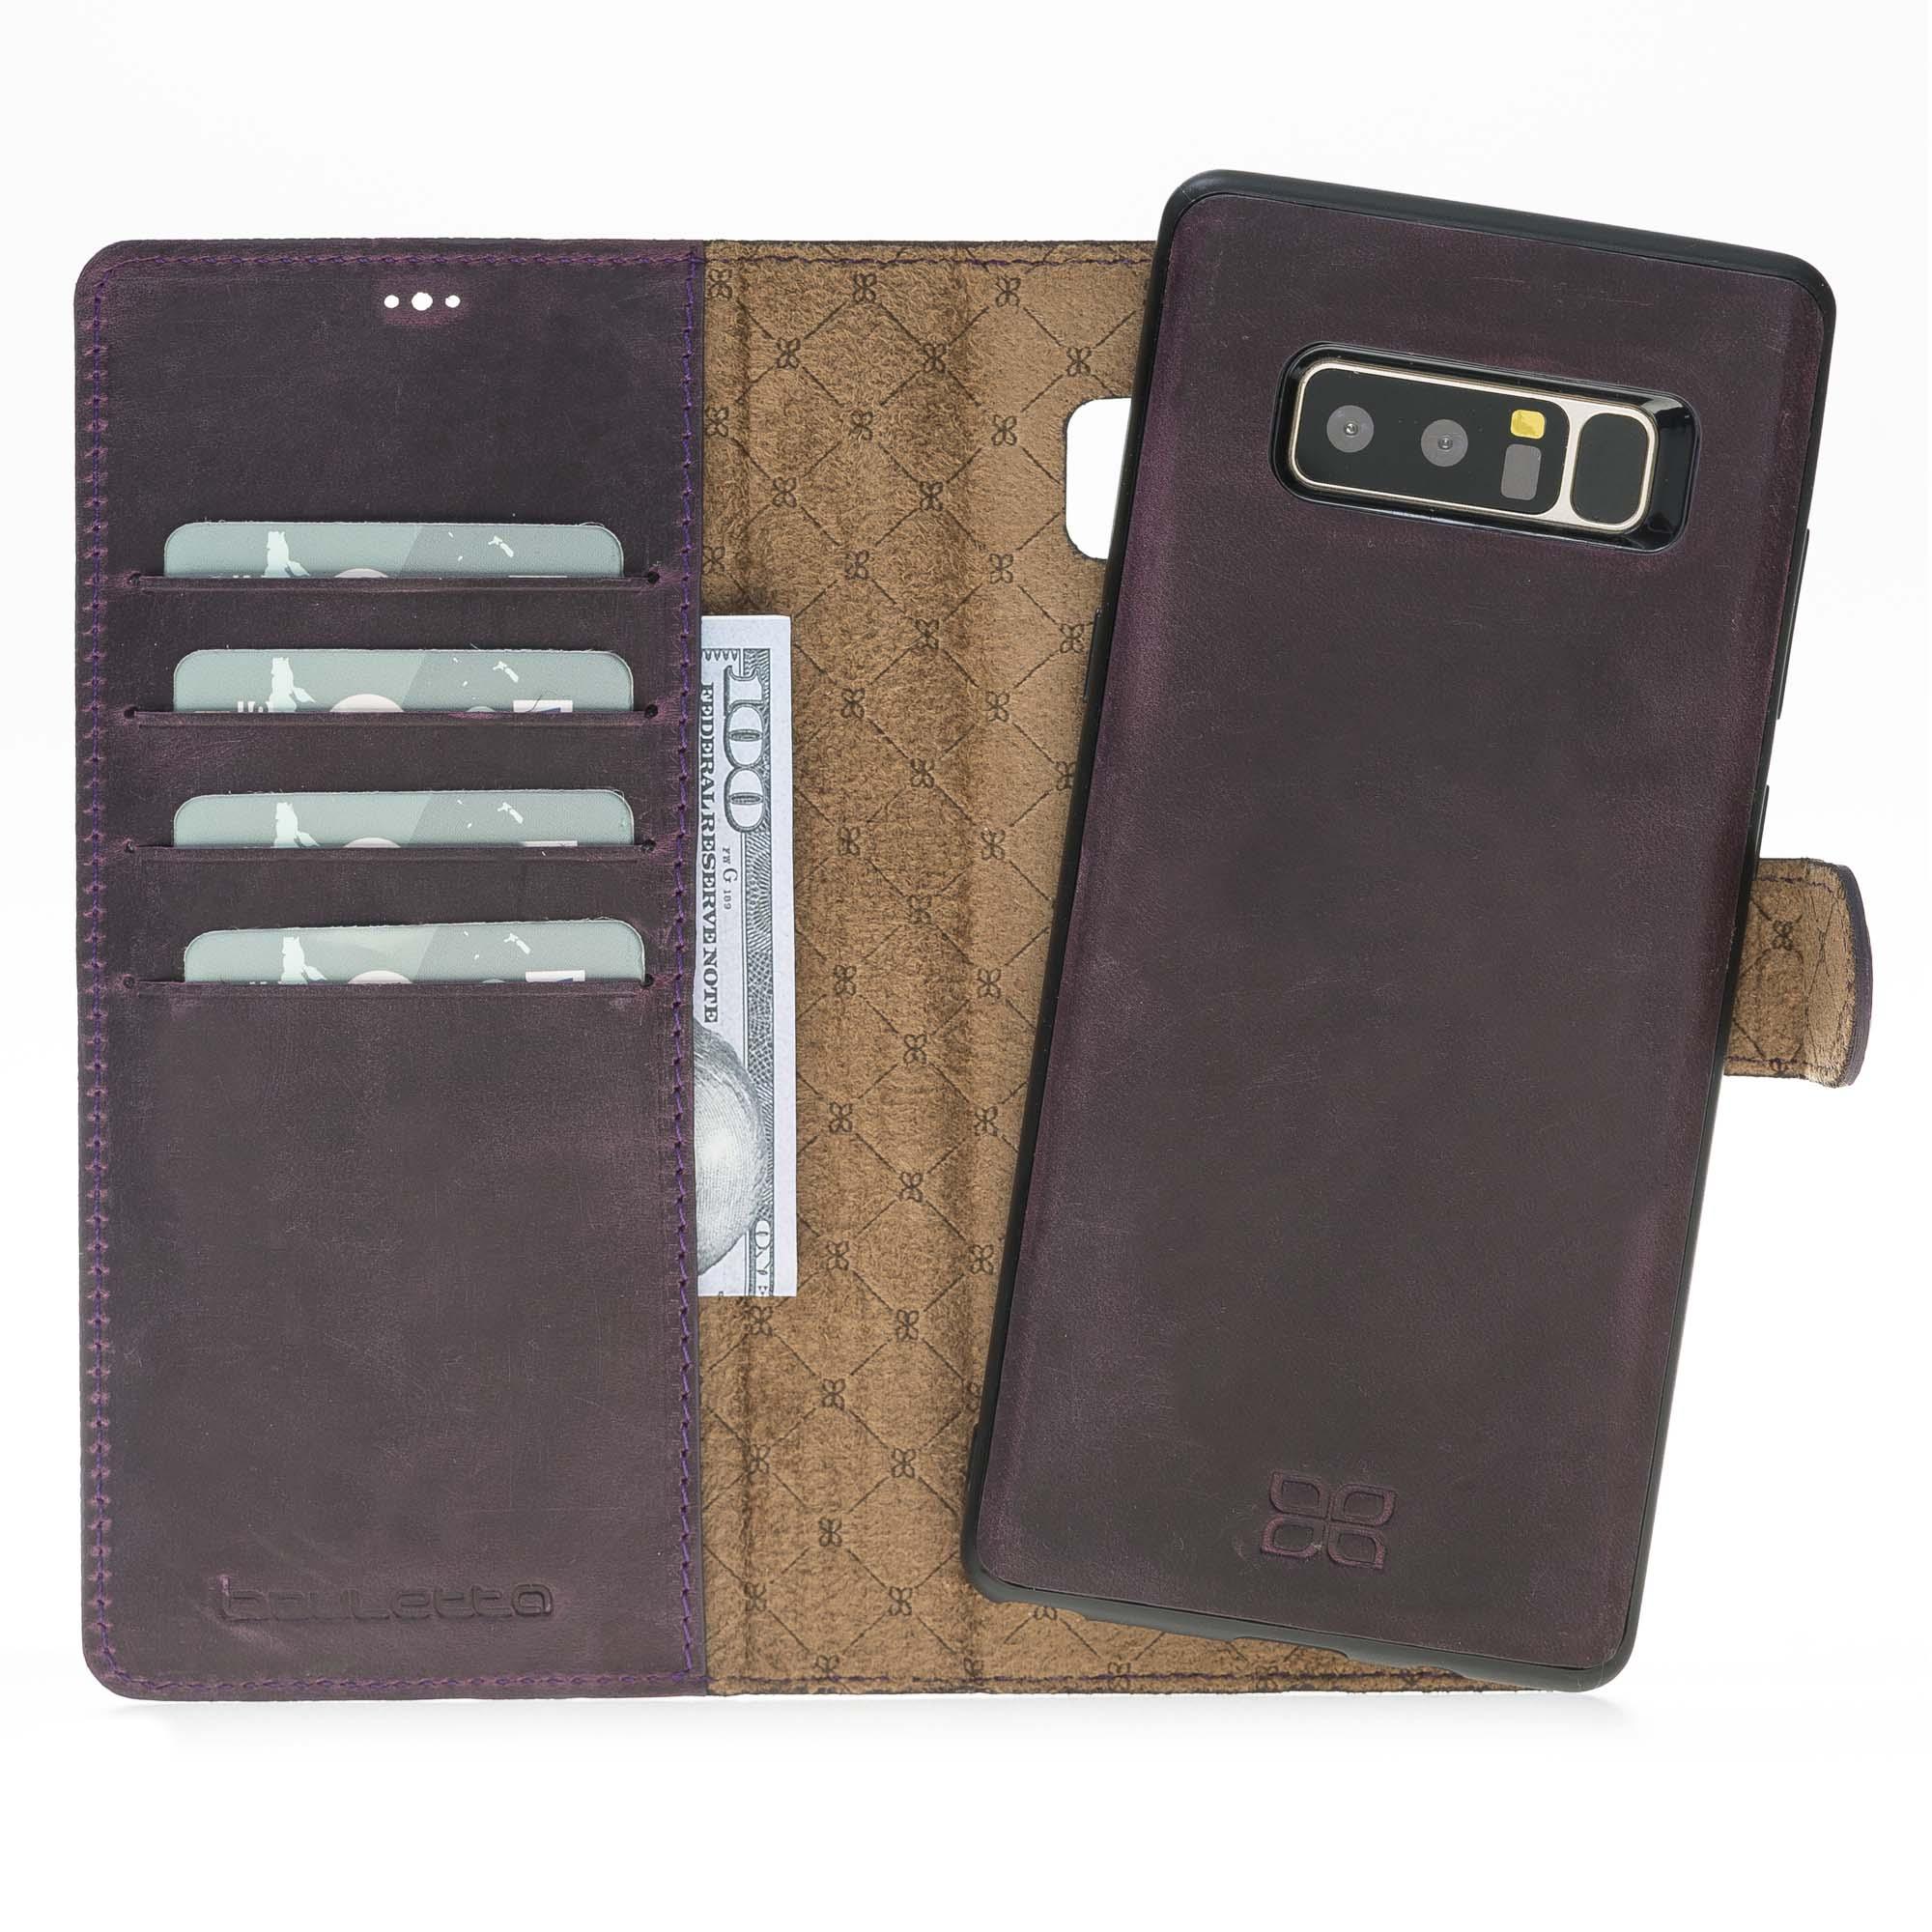 Чехол MagicWallet Bouletta Сливовый-G7 для Samsung Galaxy Note 8